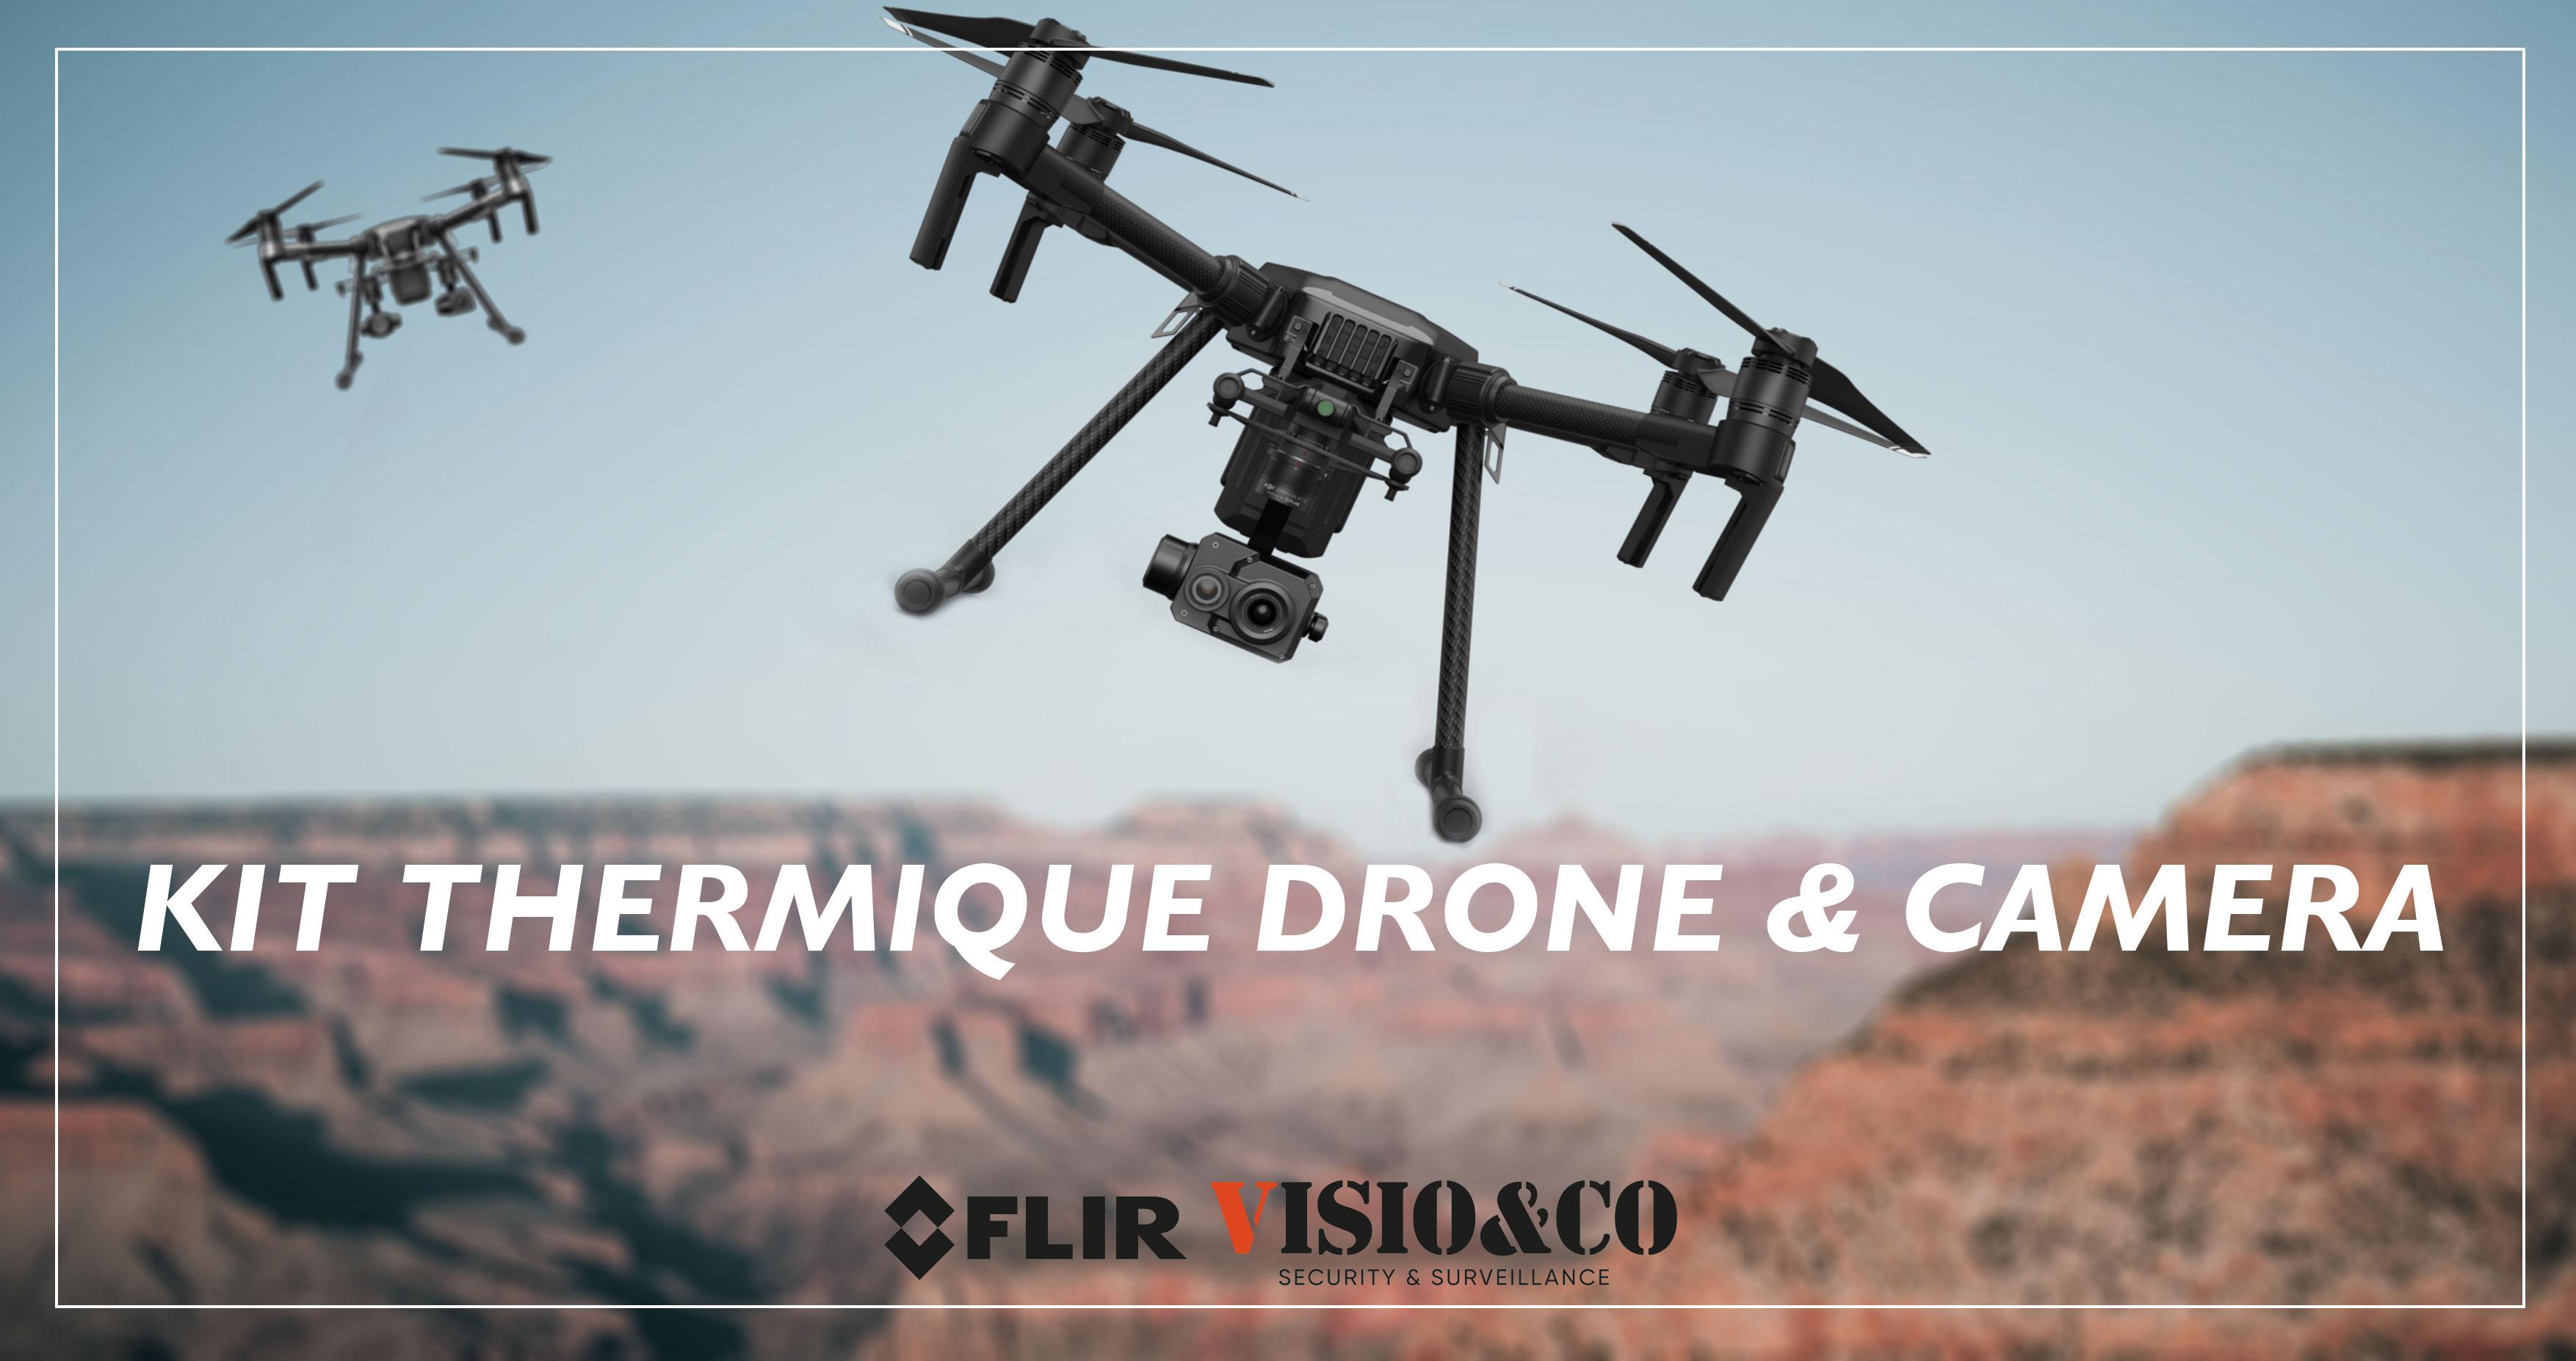 Photos flir drones